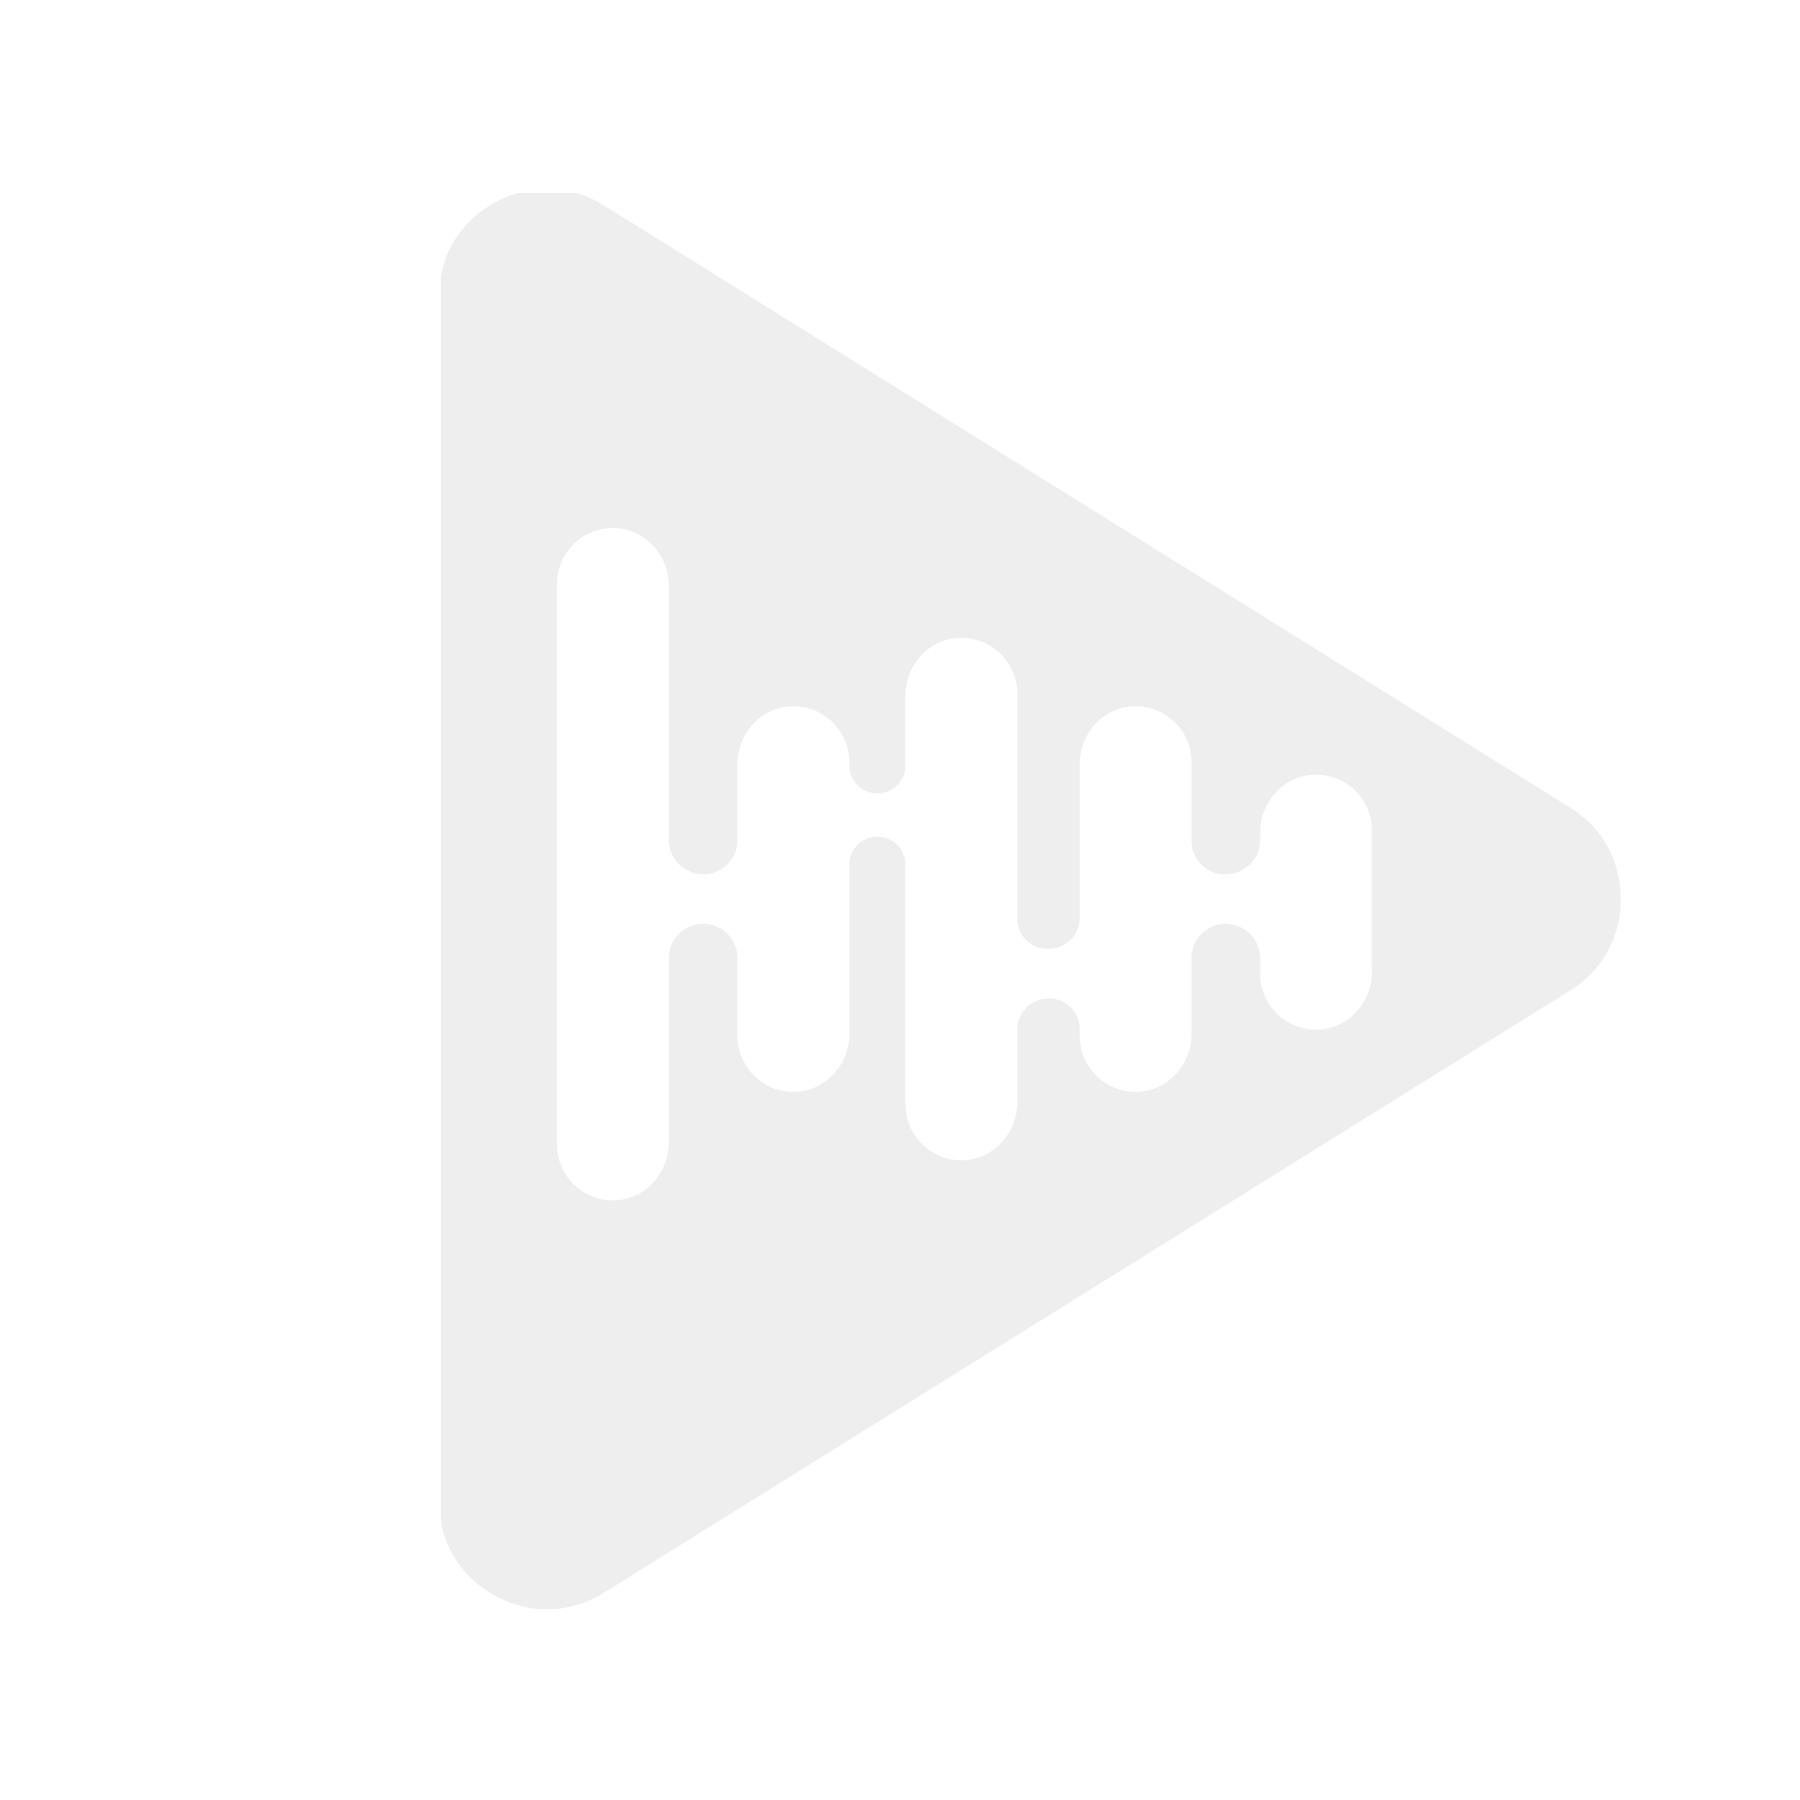 Oehlbach 3901 SILVER EXPRESS 100 - Audiokabel RCA-RCA, 24k gull, OFC, 2x skjerm, 1m